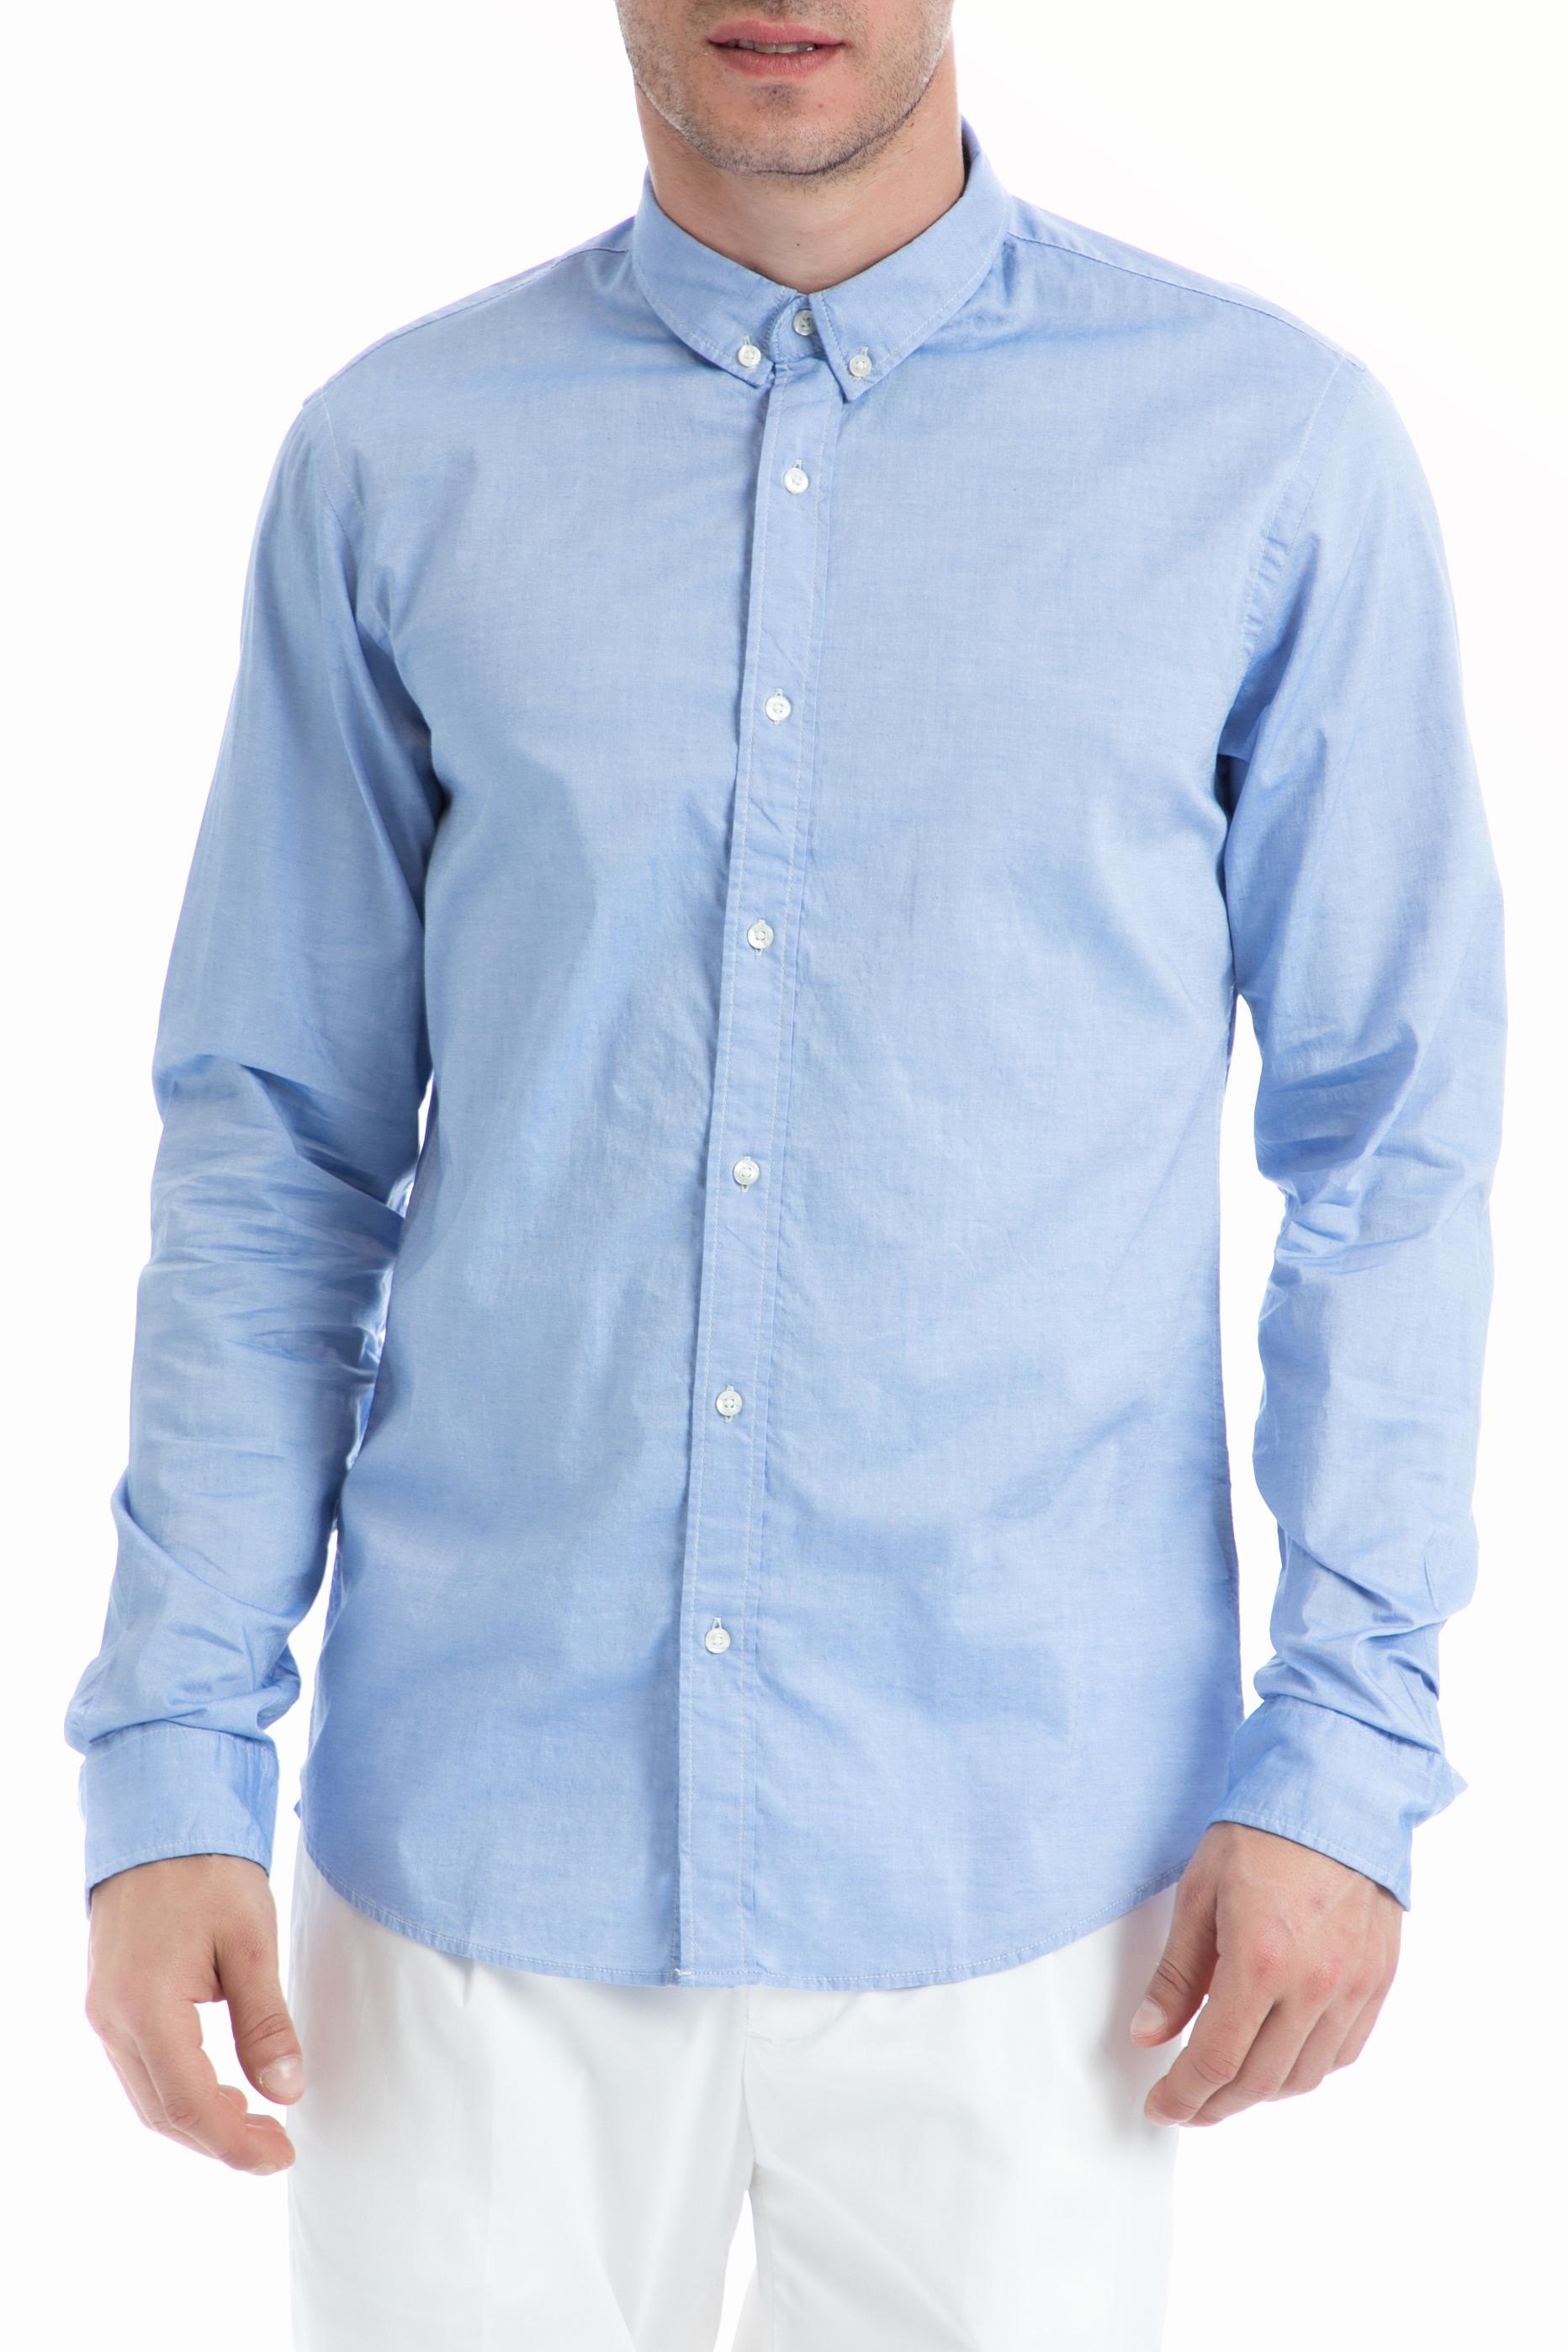 SCOTCH & SODA - Ανδρικό πουκάμισο SCOTCH & SODA γαλάζιο ανδρικά ρούχα πουκάμισα μακρυμάνικα